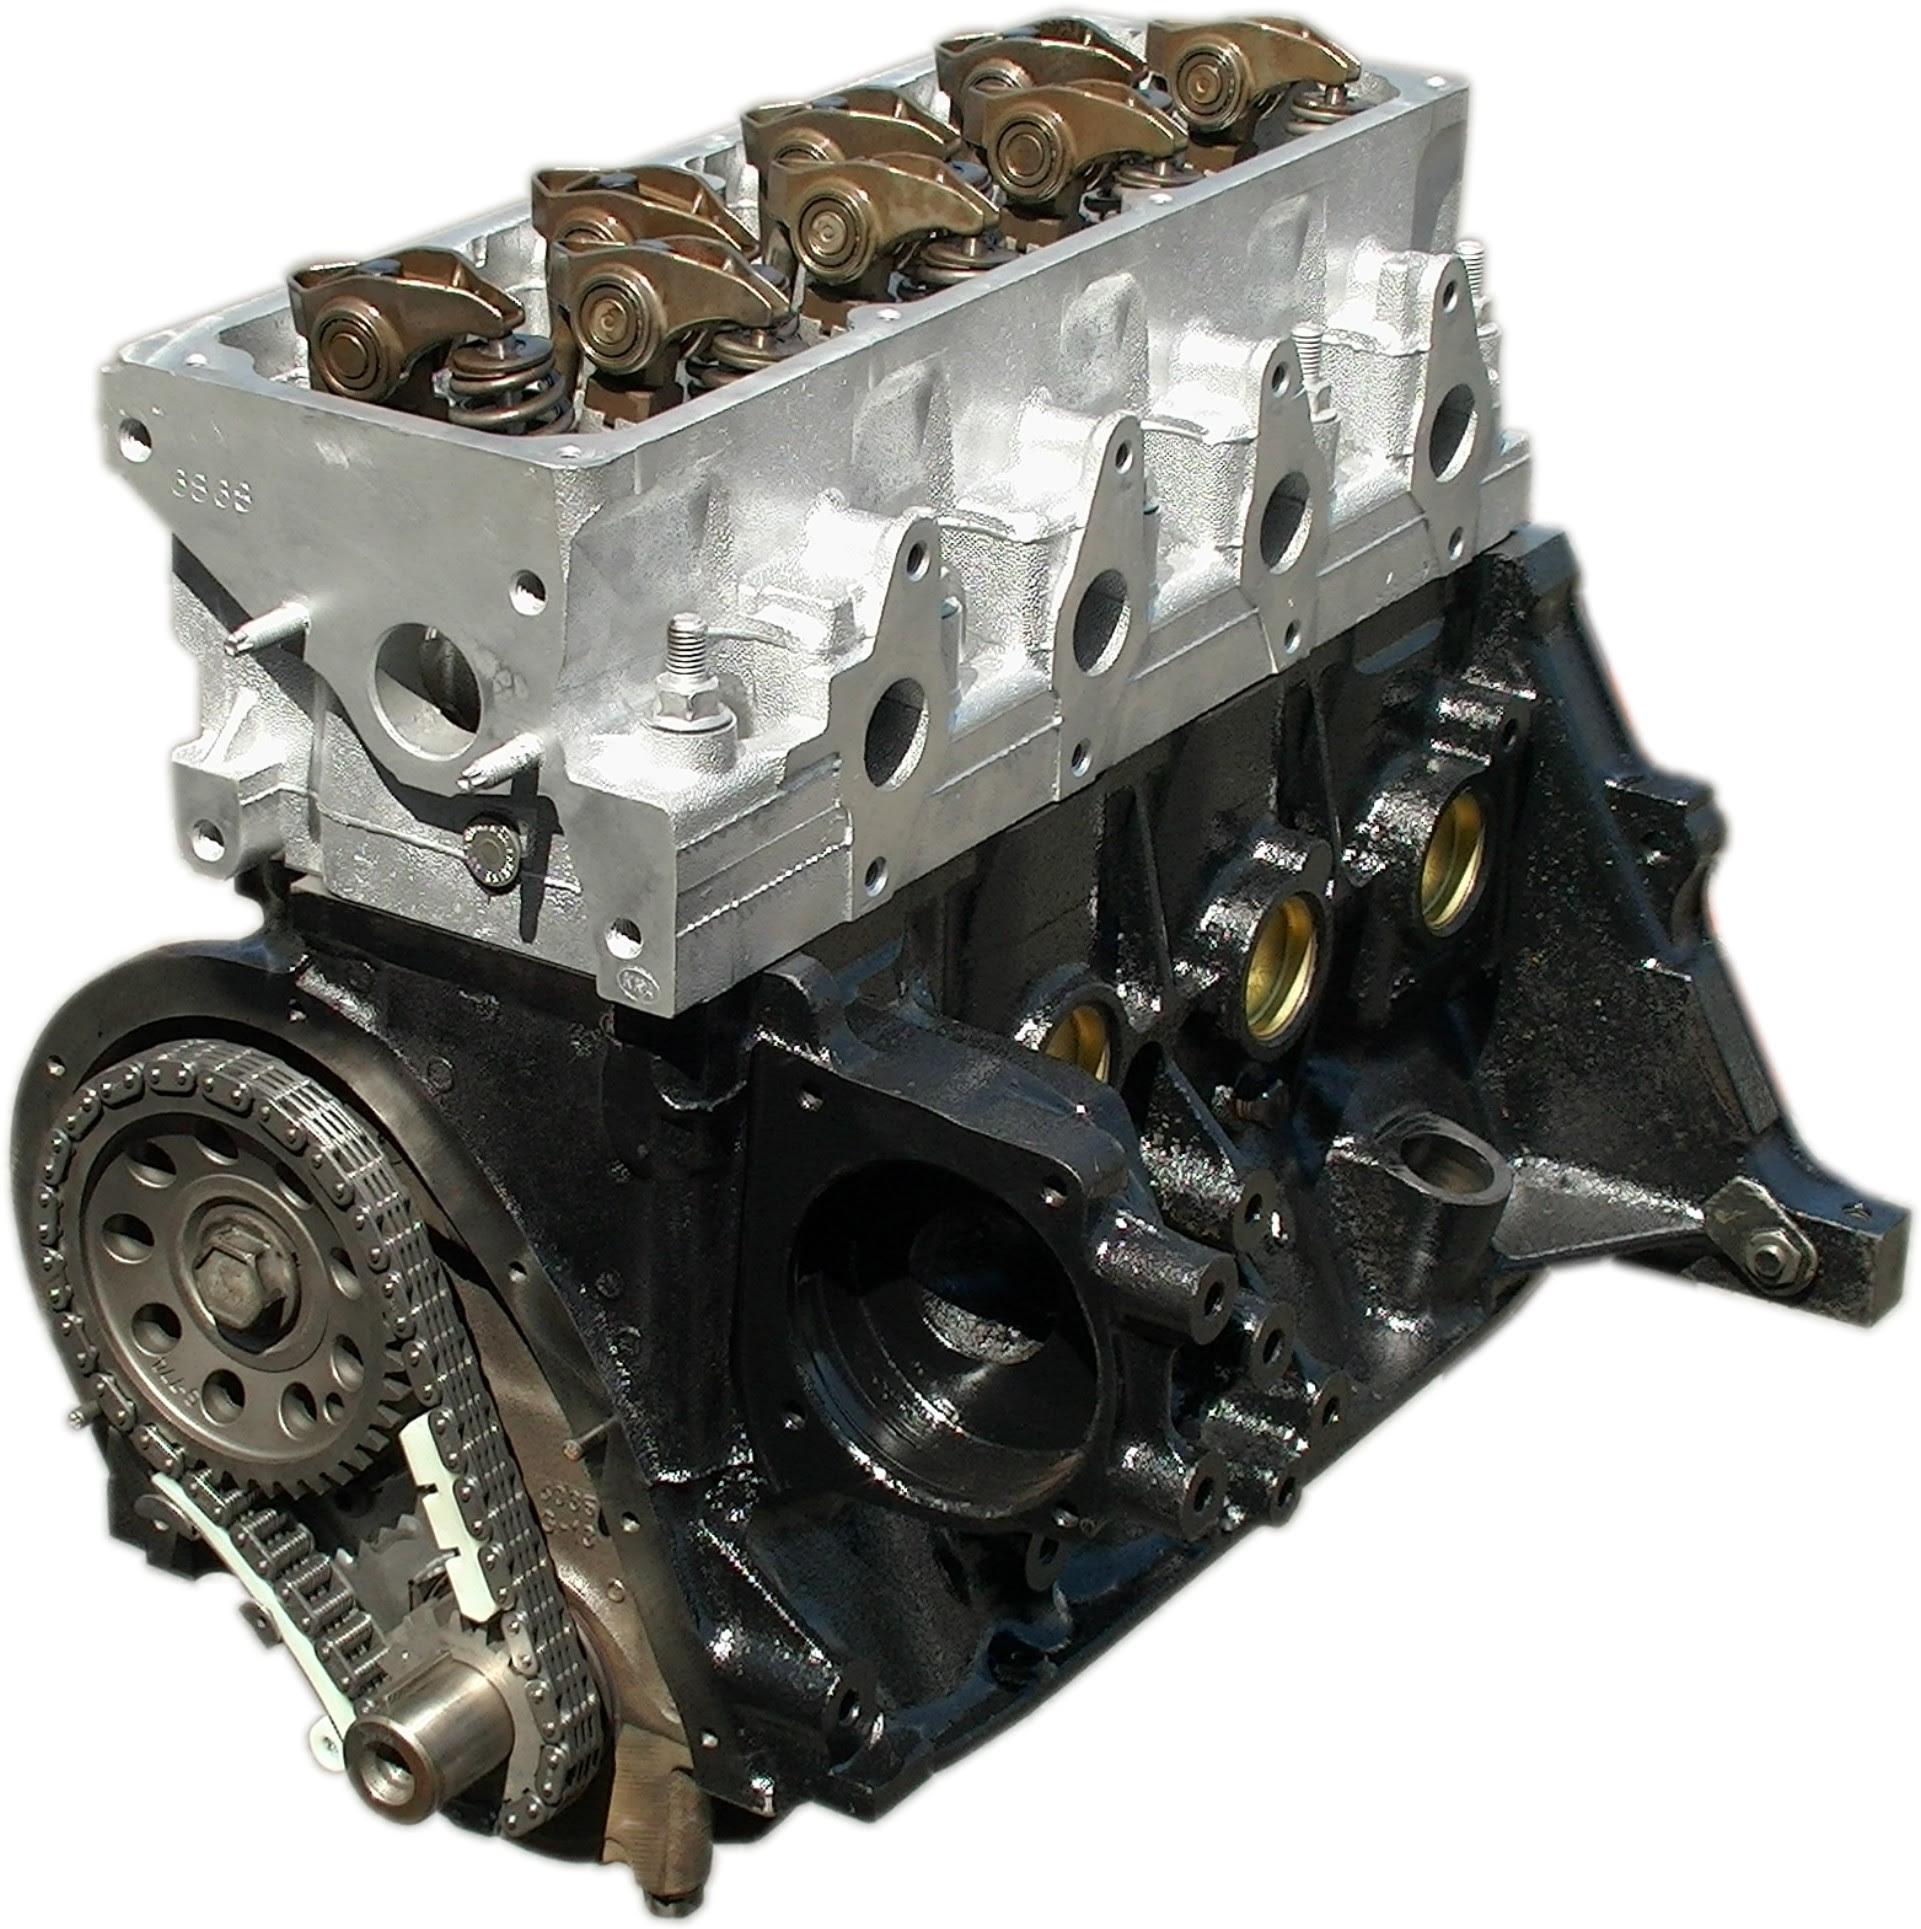 S10 2 2 Engine Diagram Honda Rancher 350 Es Fuse Box Begeboy Wiring Diagram Source